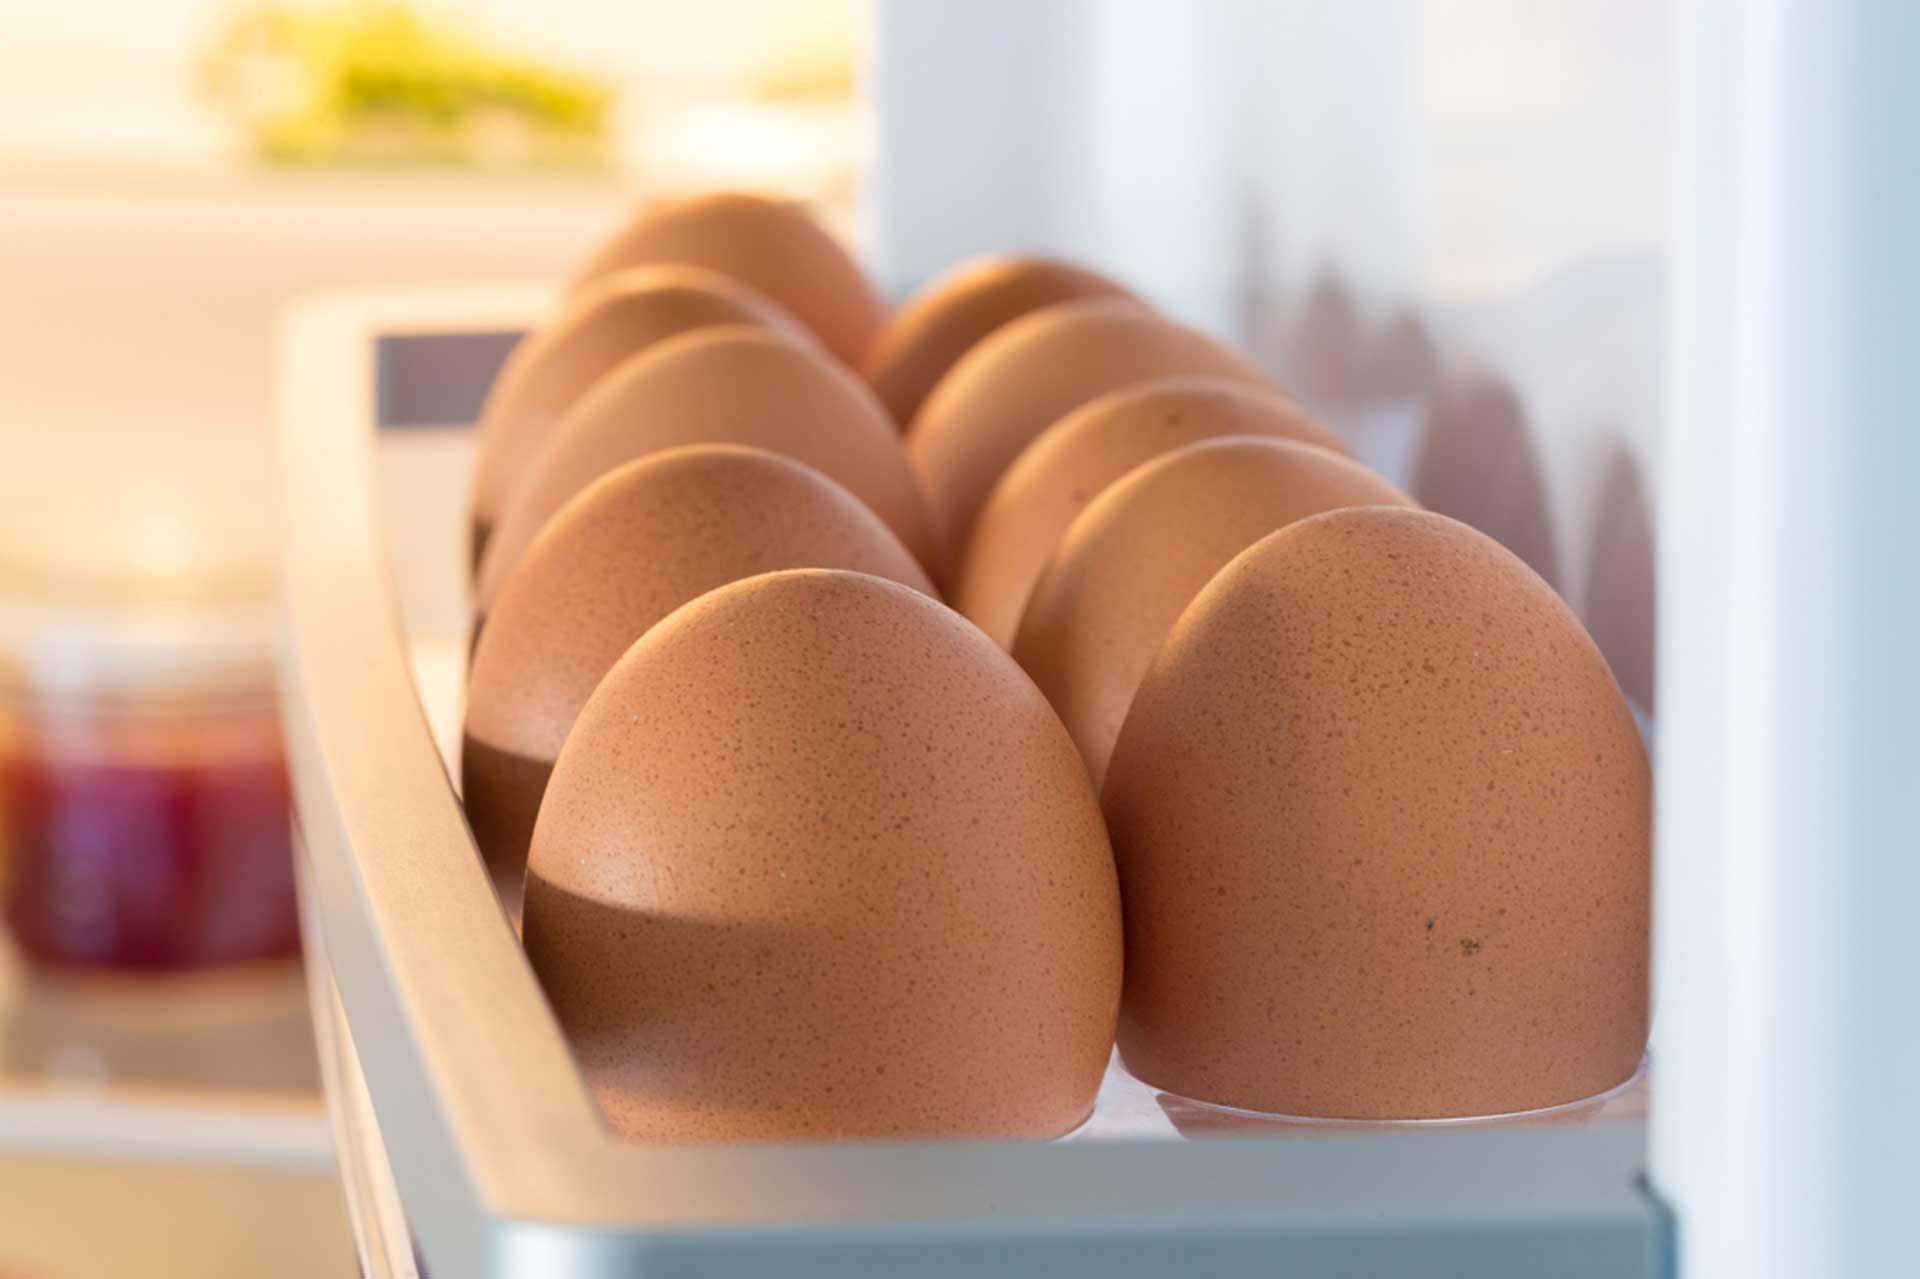 Conservar huevos en la nevera o fuera